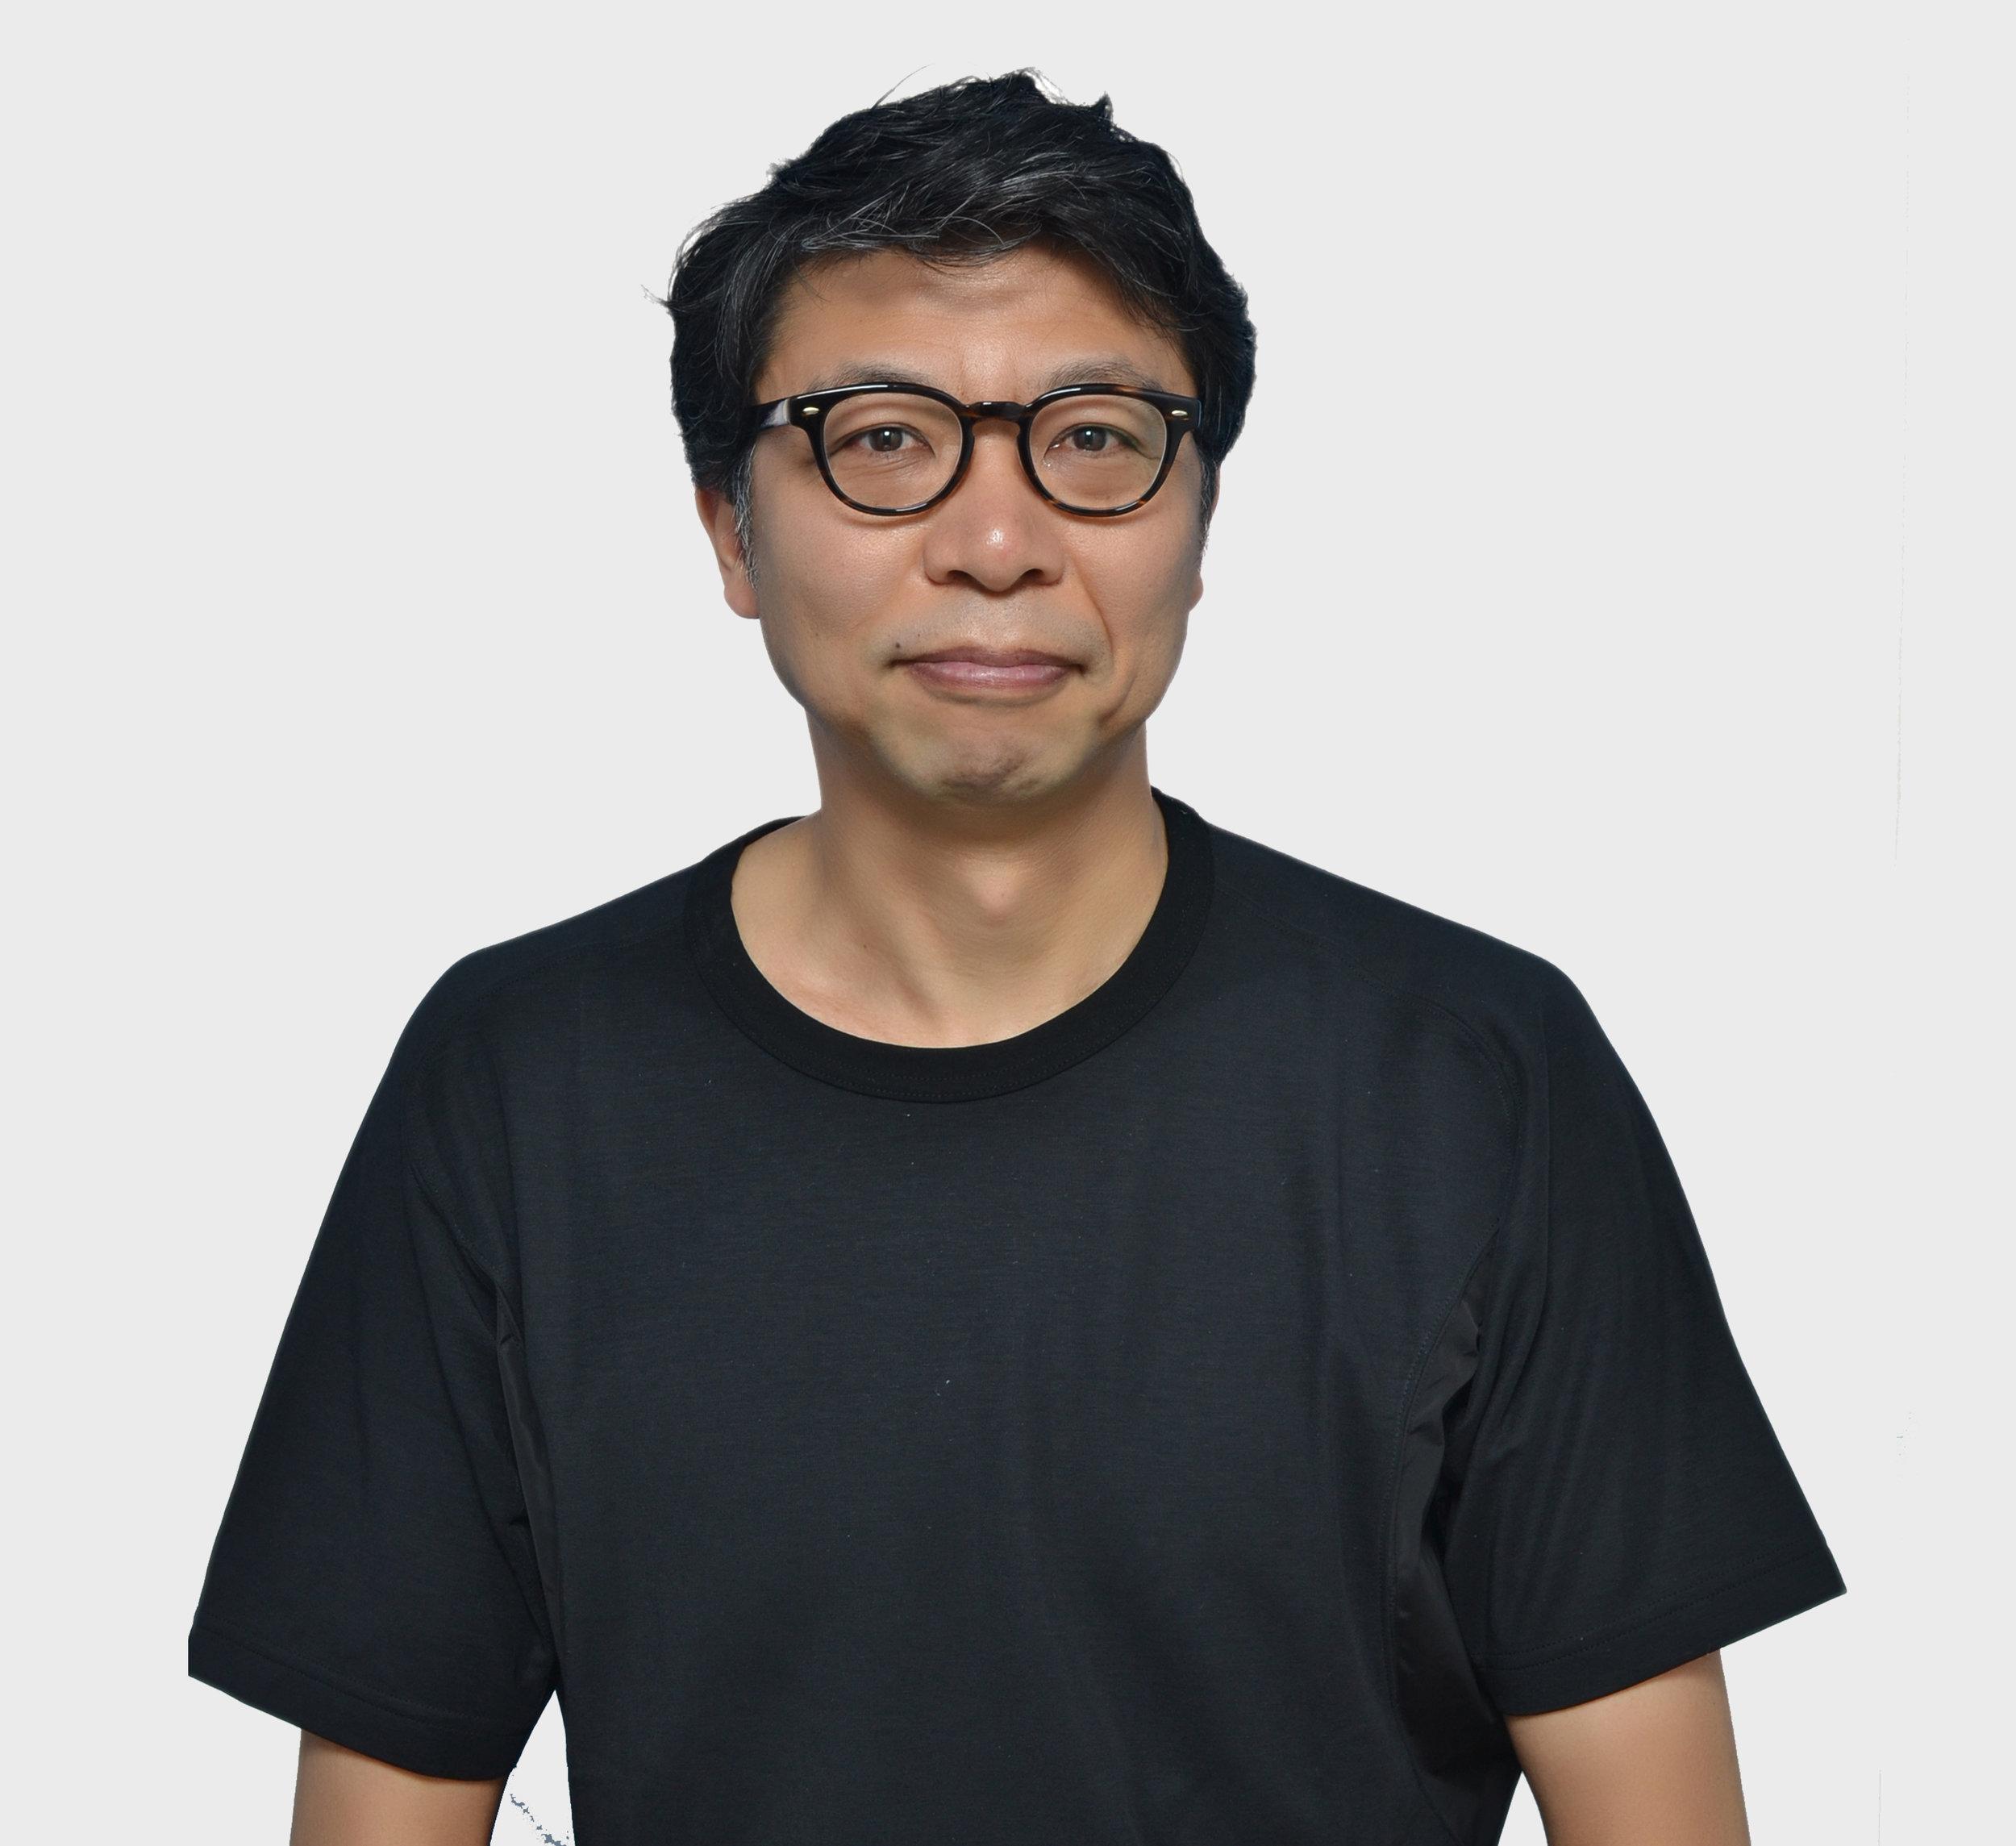 Japan - Keita Fujiwarakeita.fujiwara@paptic.com